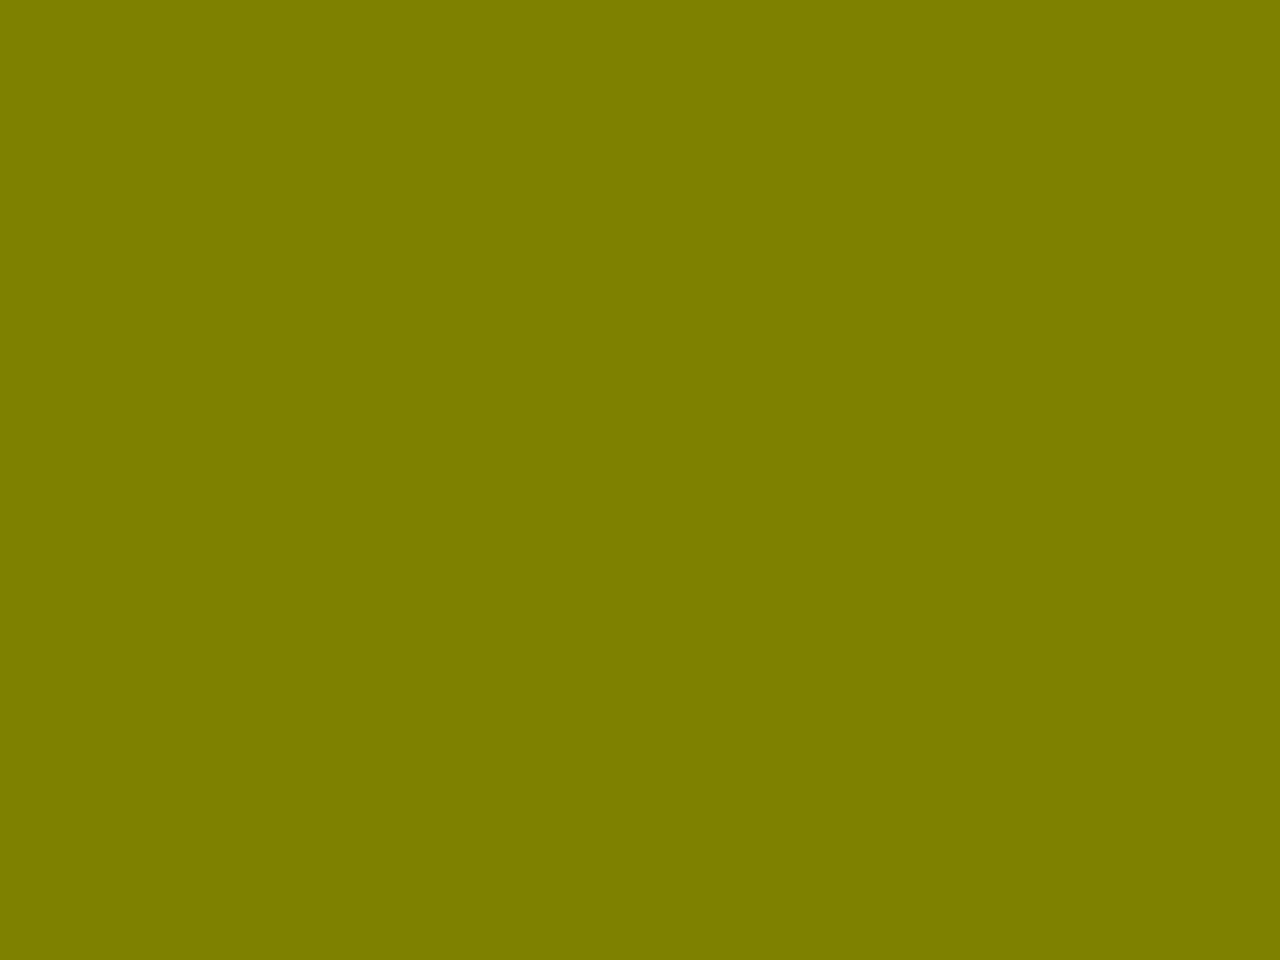 1280x960 Olive Solid Color Background